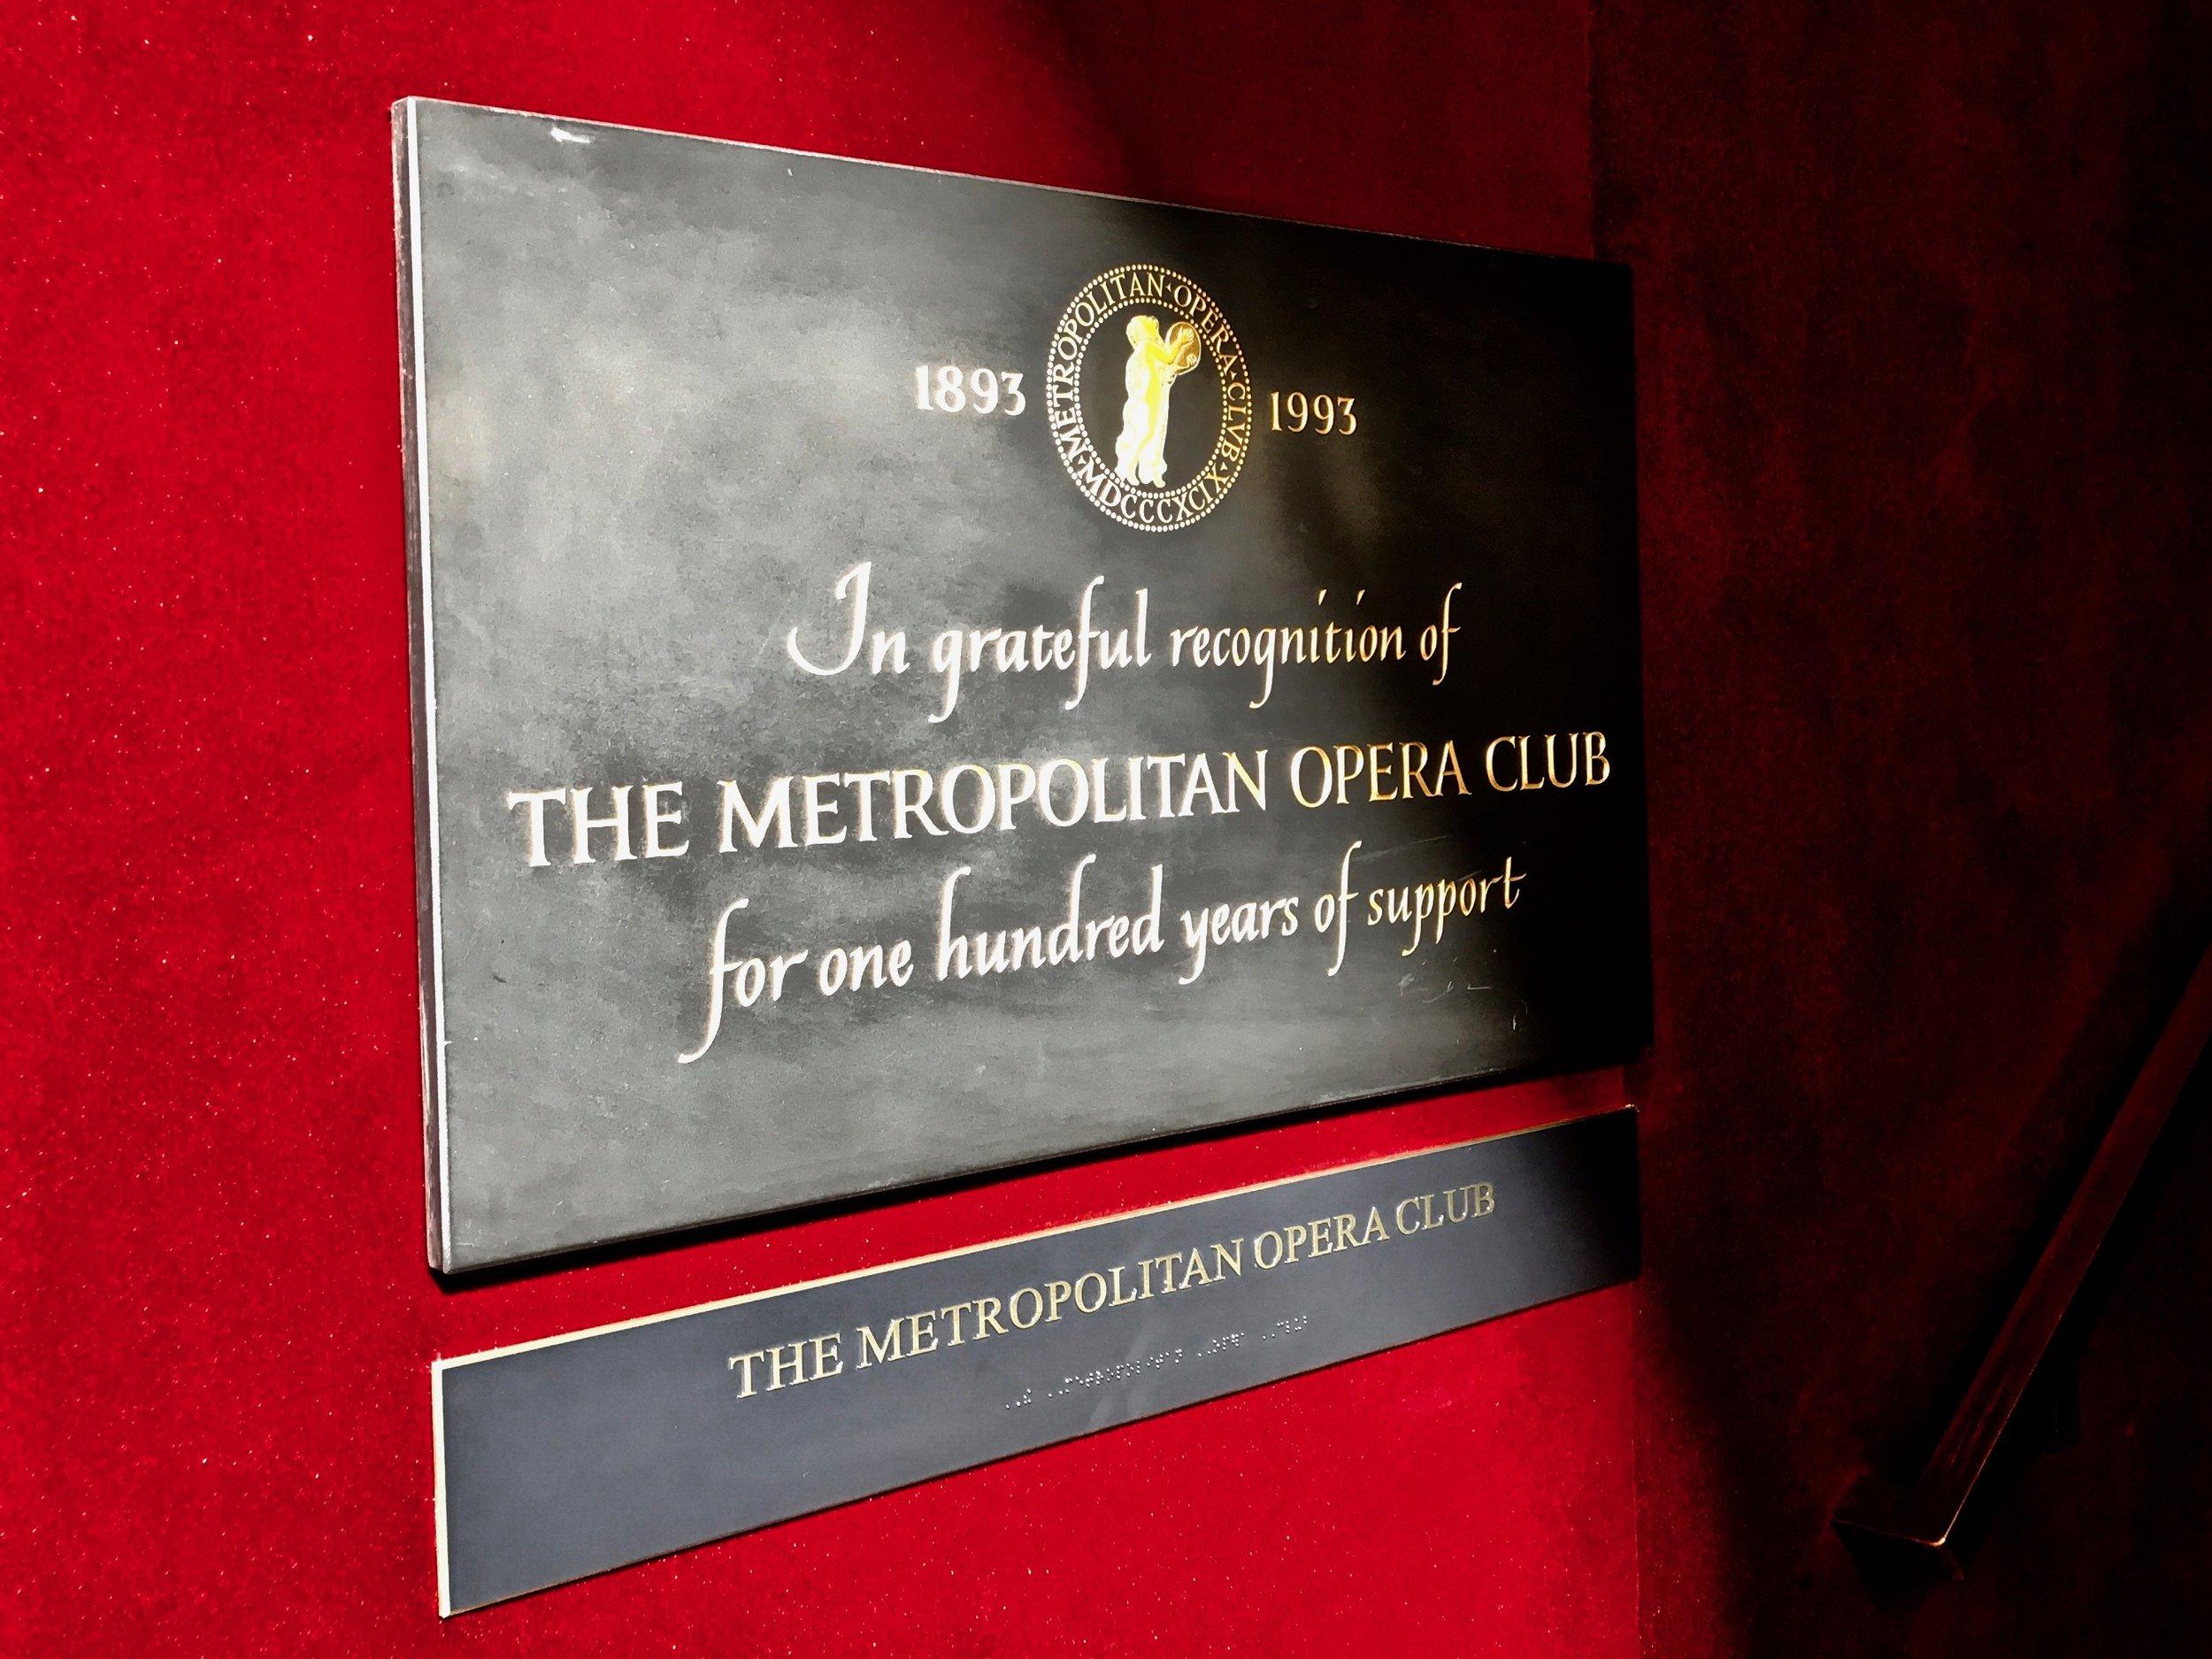 The plaque that greets you as you enter the Metropolitan Opera Club space. (Photo: Daniel Clark Smith)